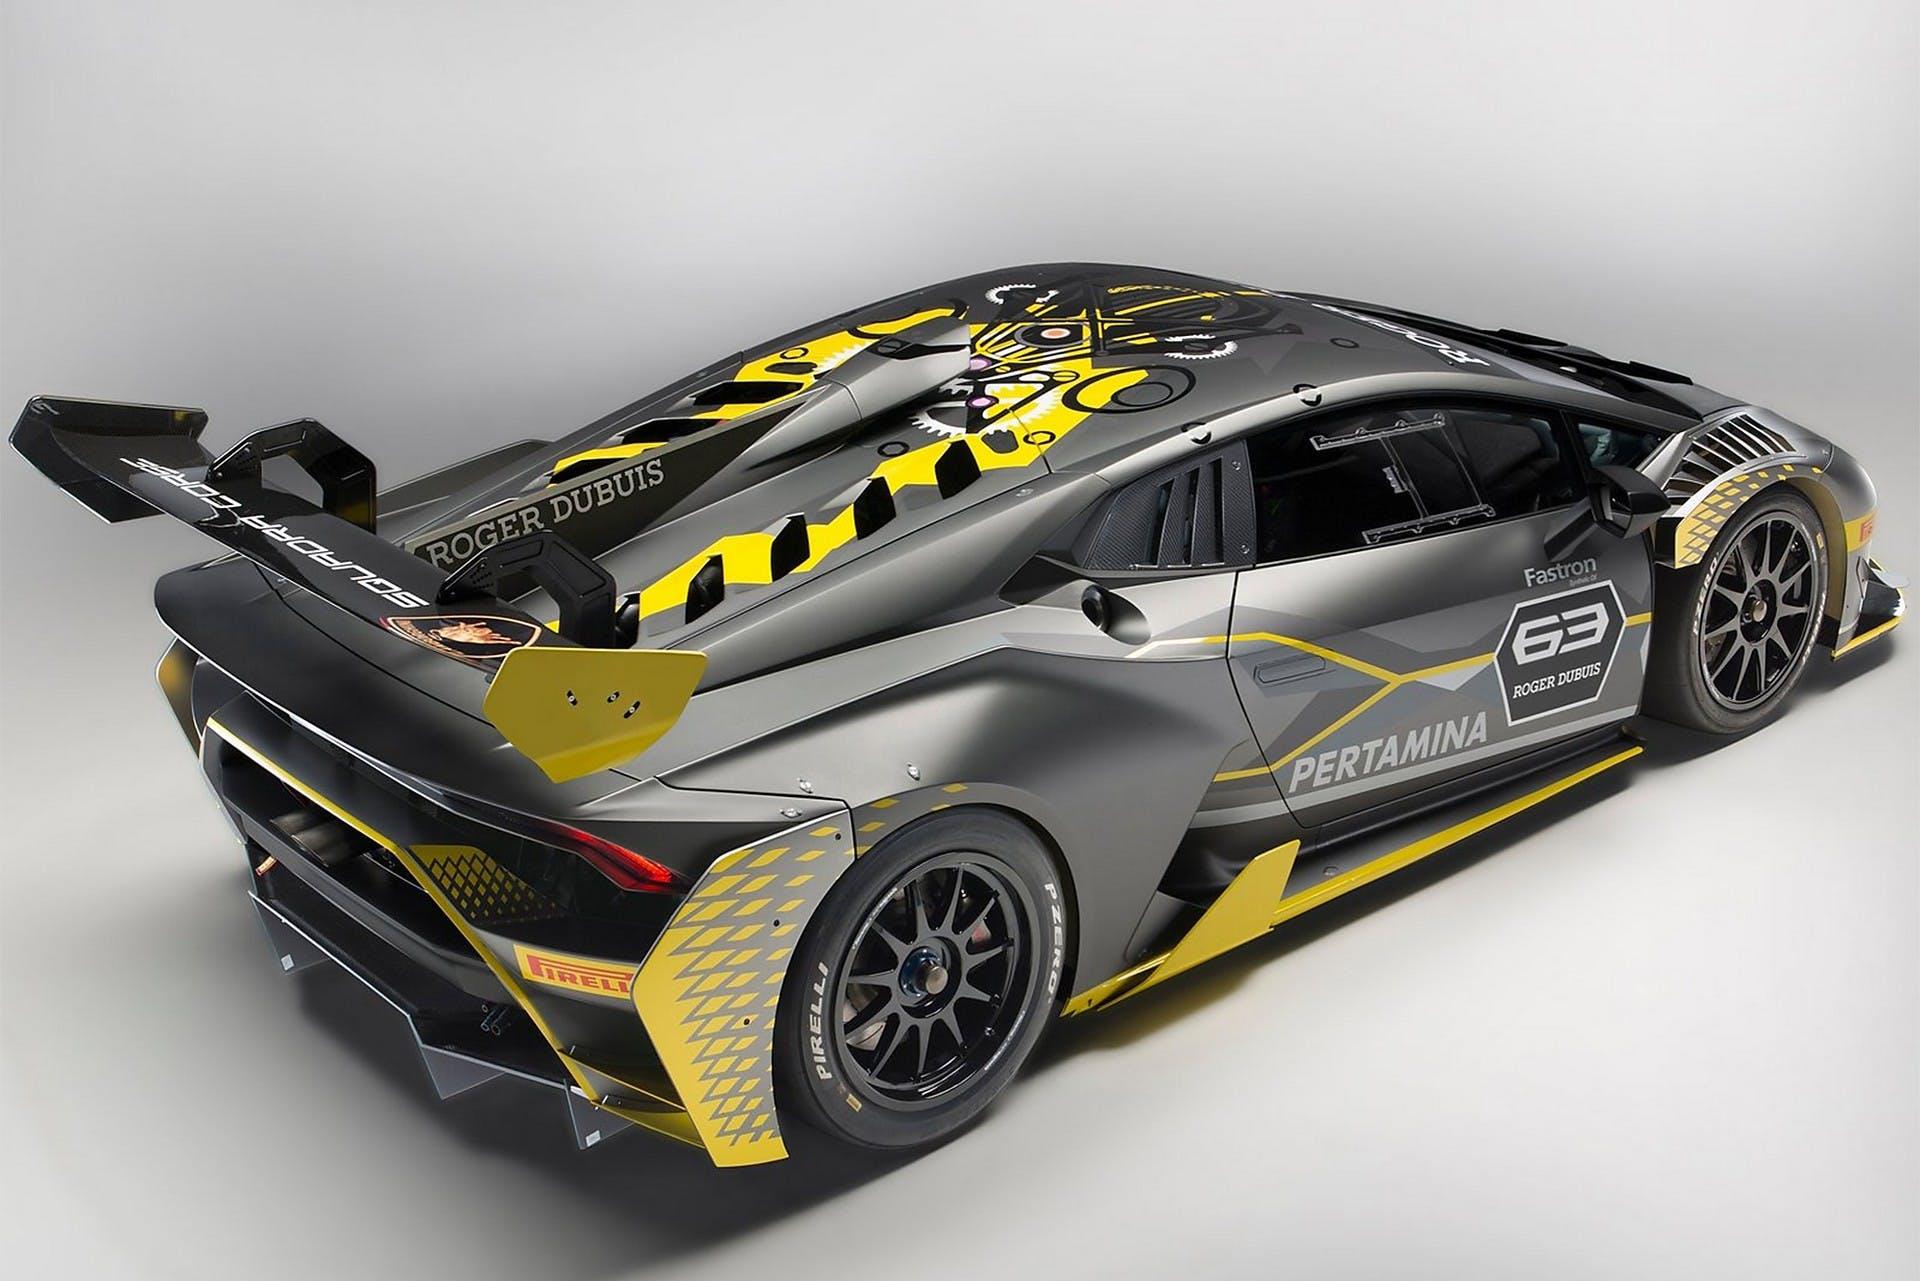 Lamborghini Huracán Super Trofeo Evo statica